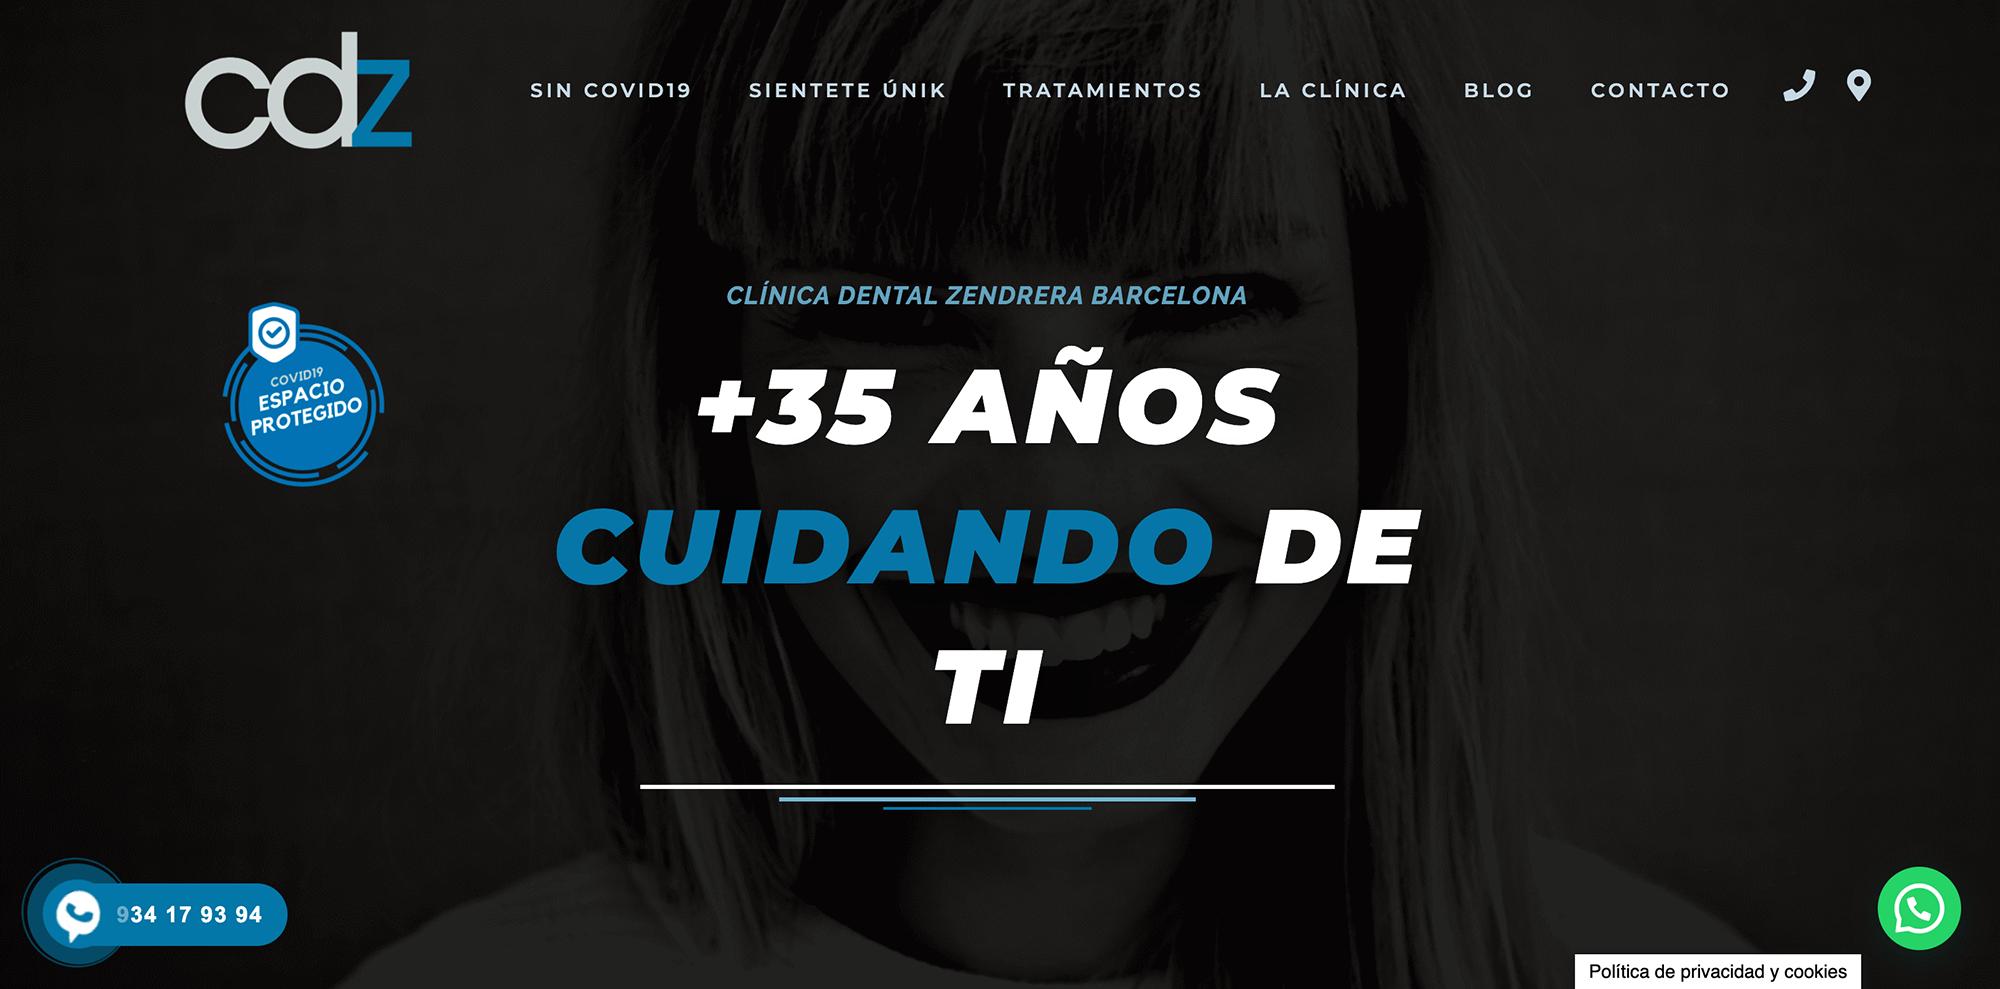 CDZ web